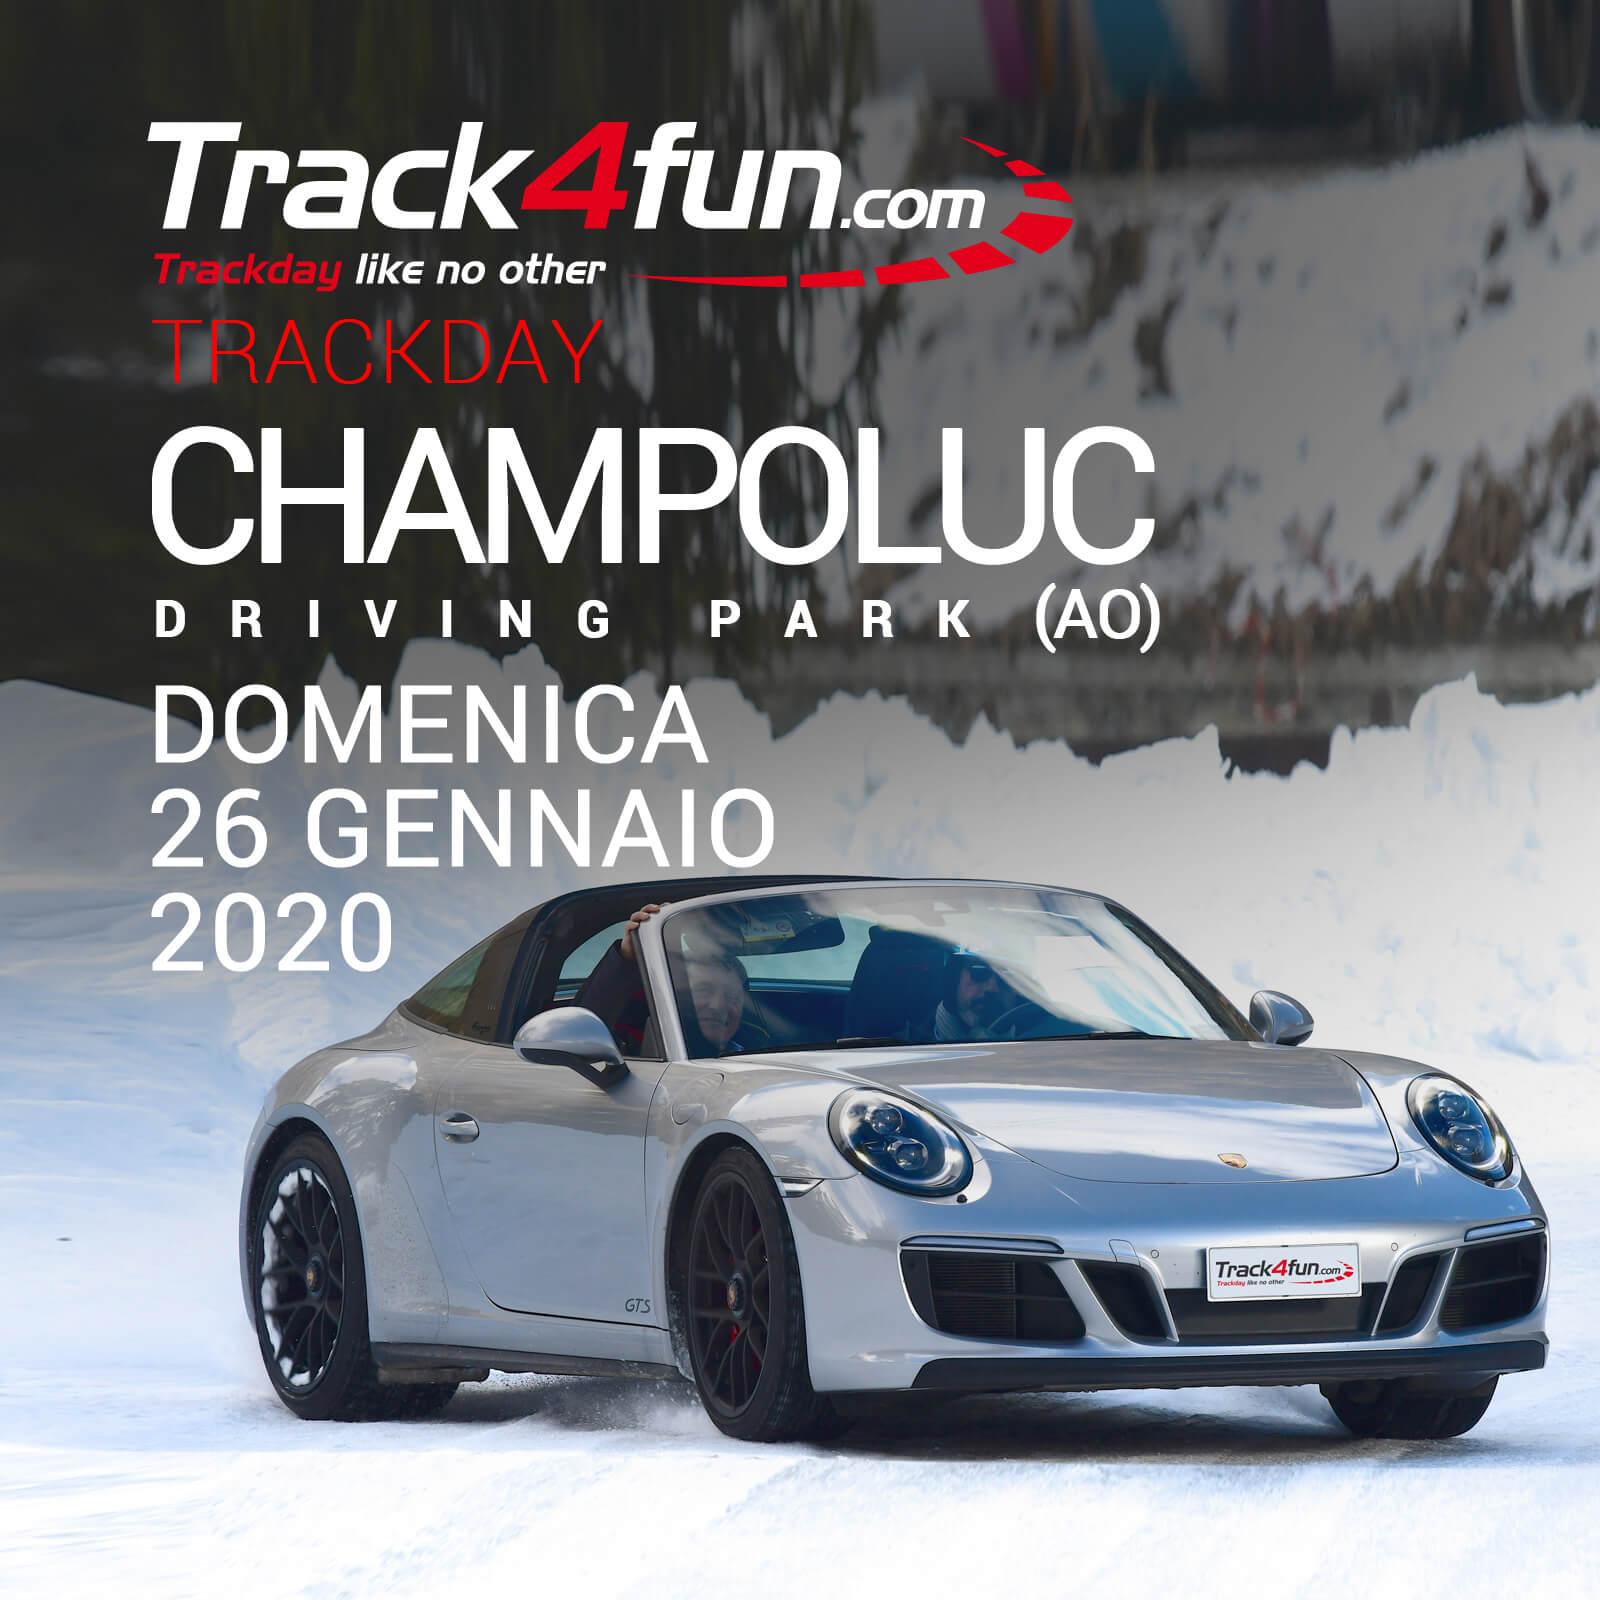 In Pista A Champoluc Driving Park – 26 Gennaio 2020